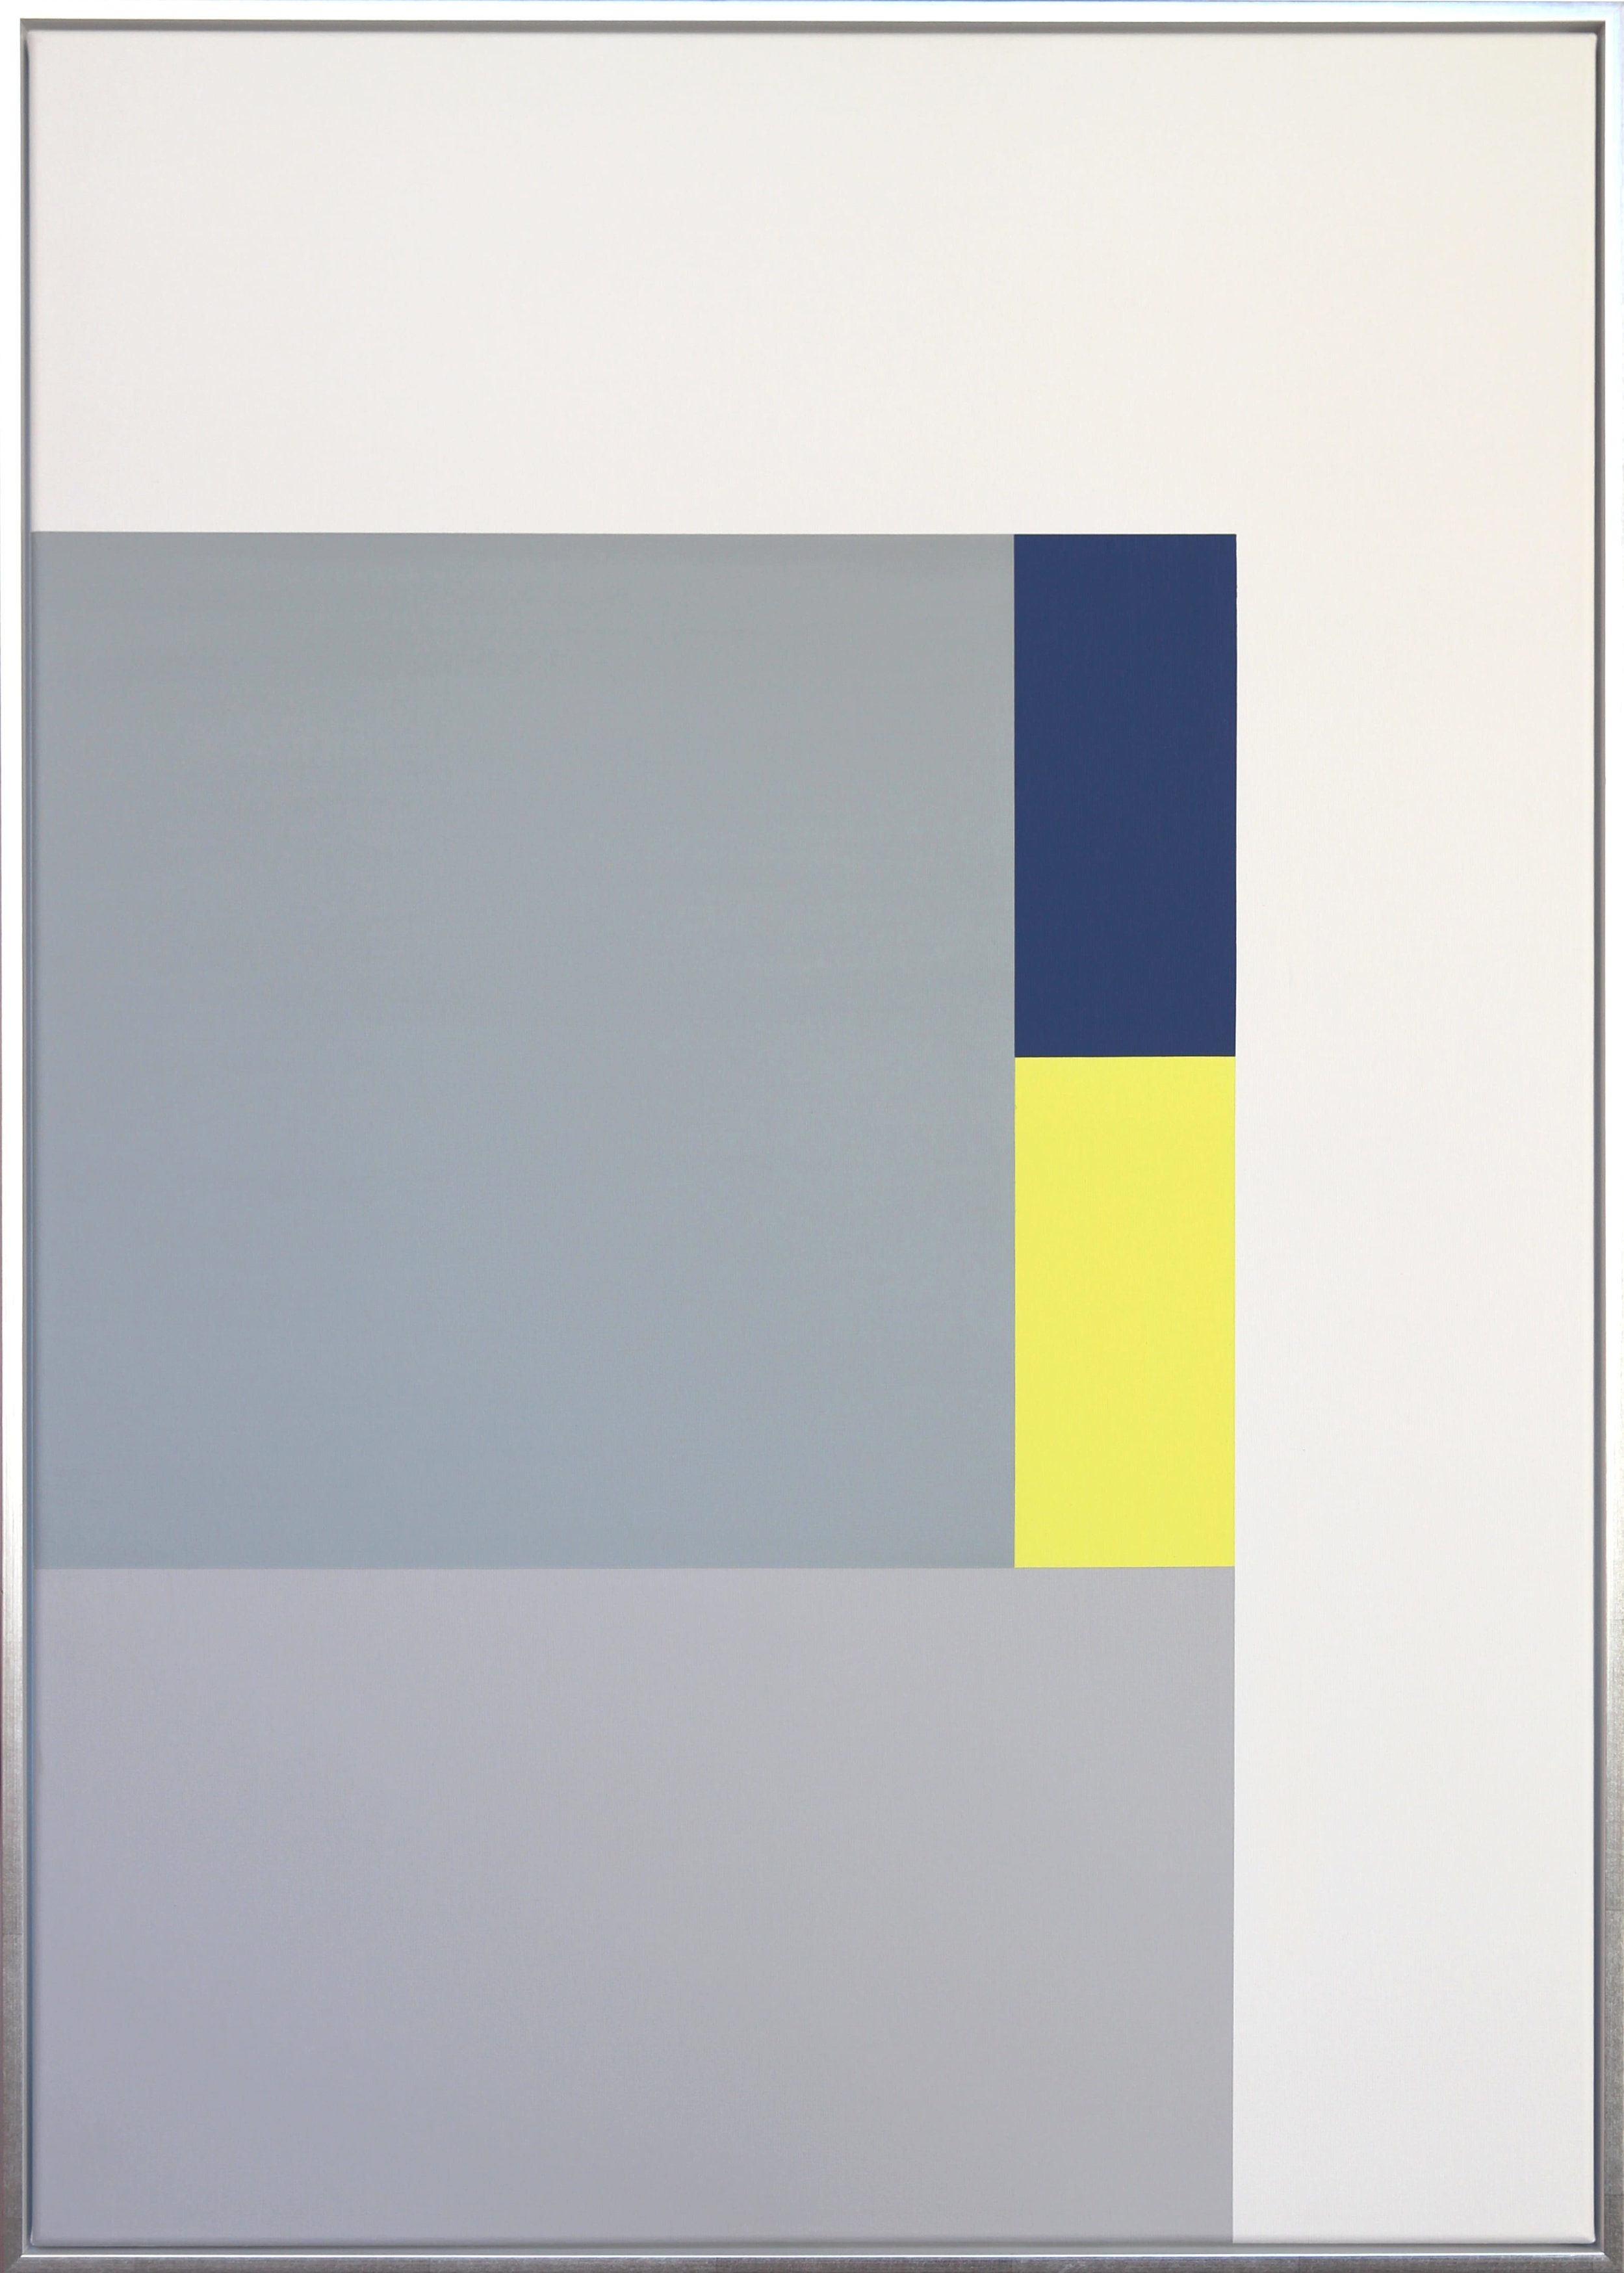 Simplicity Of Art, S22, Acrylic on Canvas, 2019